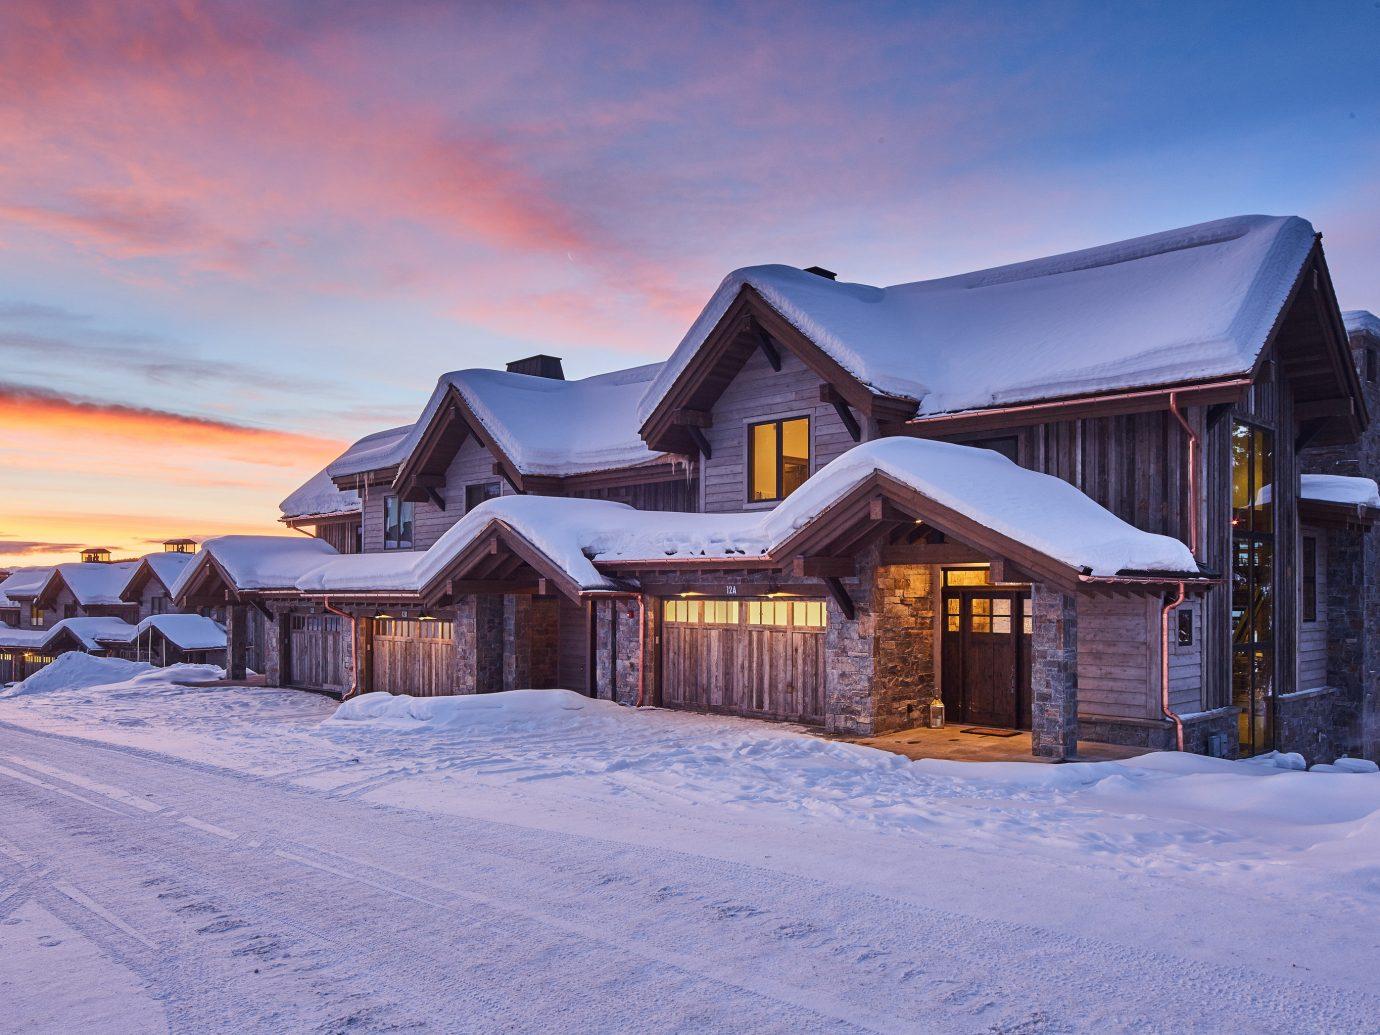 Hotels Luxury Travel Mountains + Skiing outdoor sky snow house Winter building weather season Nature home mountain estate Resort mountain range